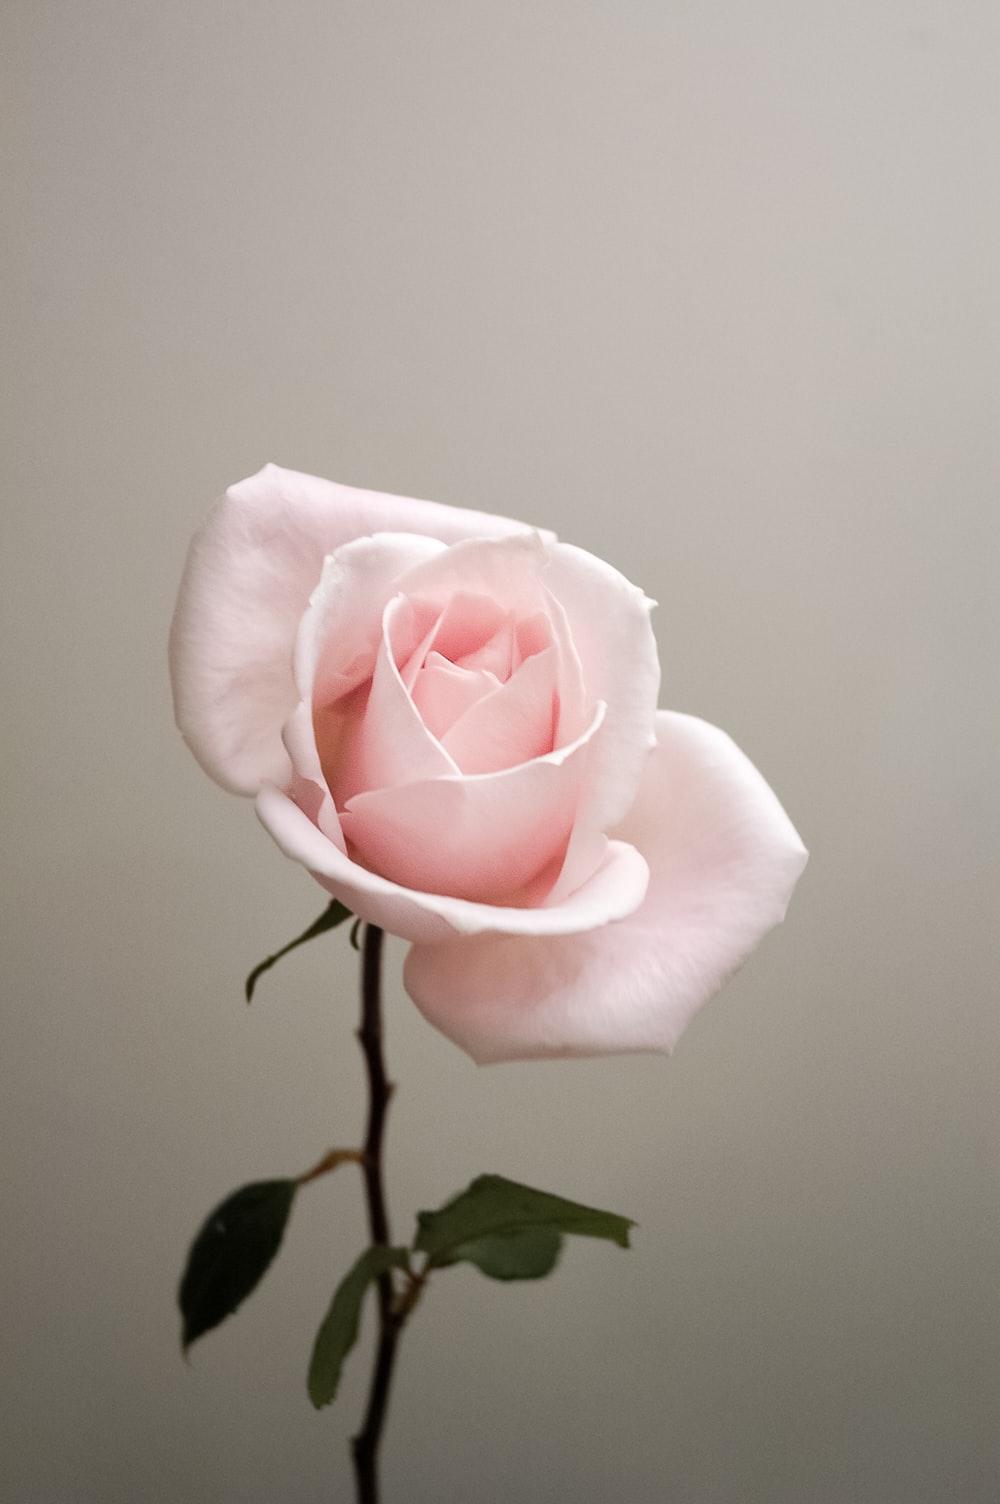 Rose Wallpapers Free Hd Download 500 Hq Unsplash